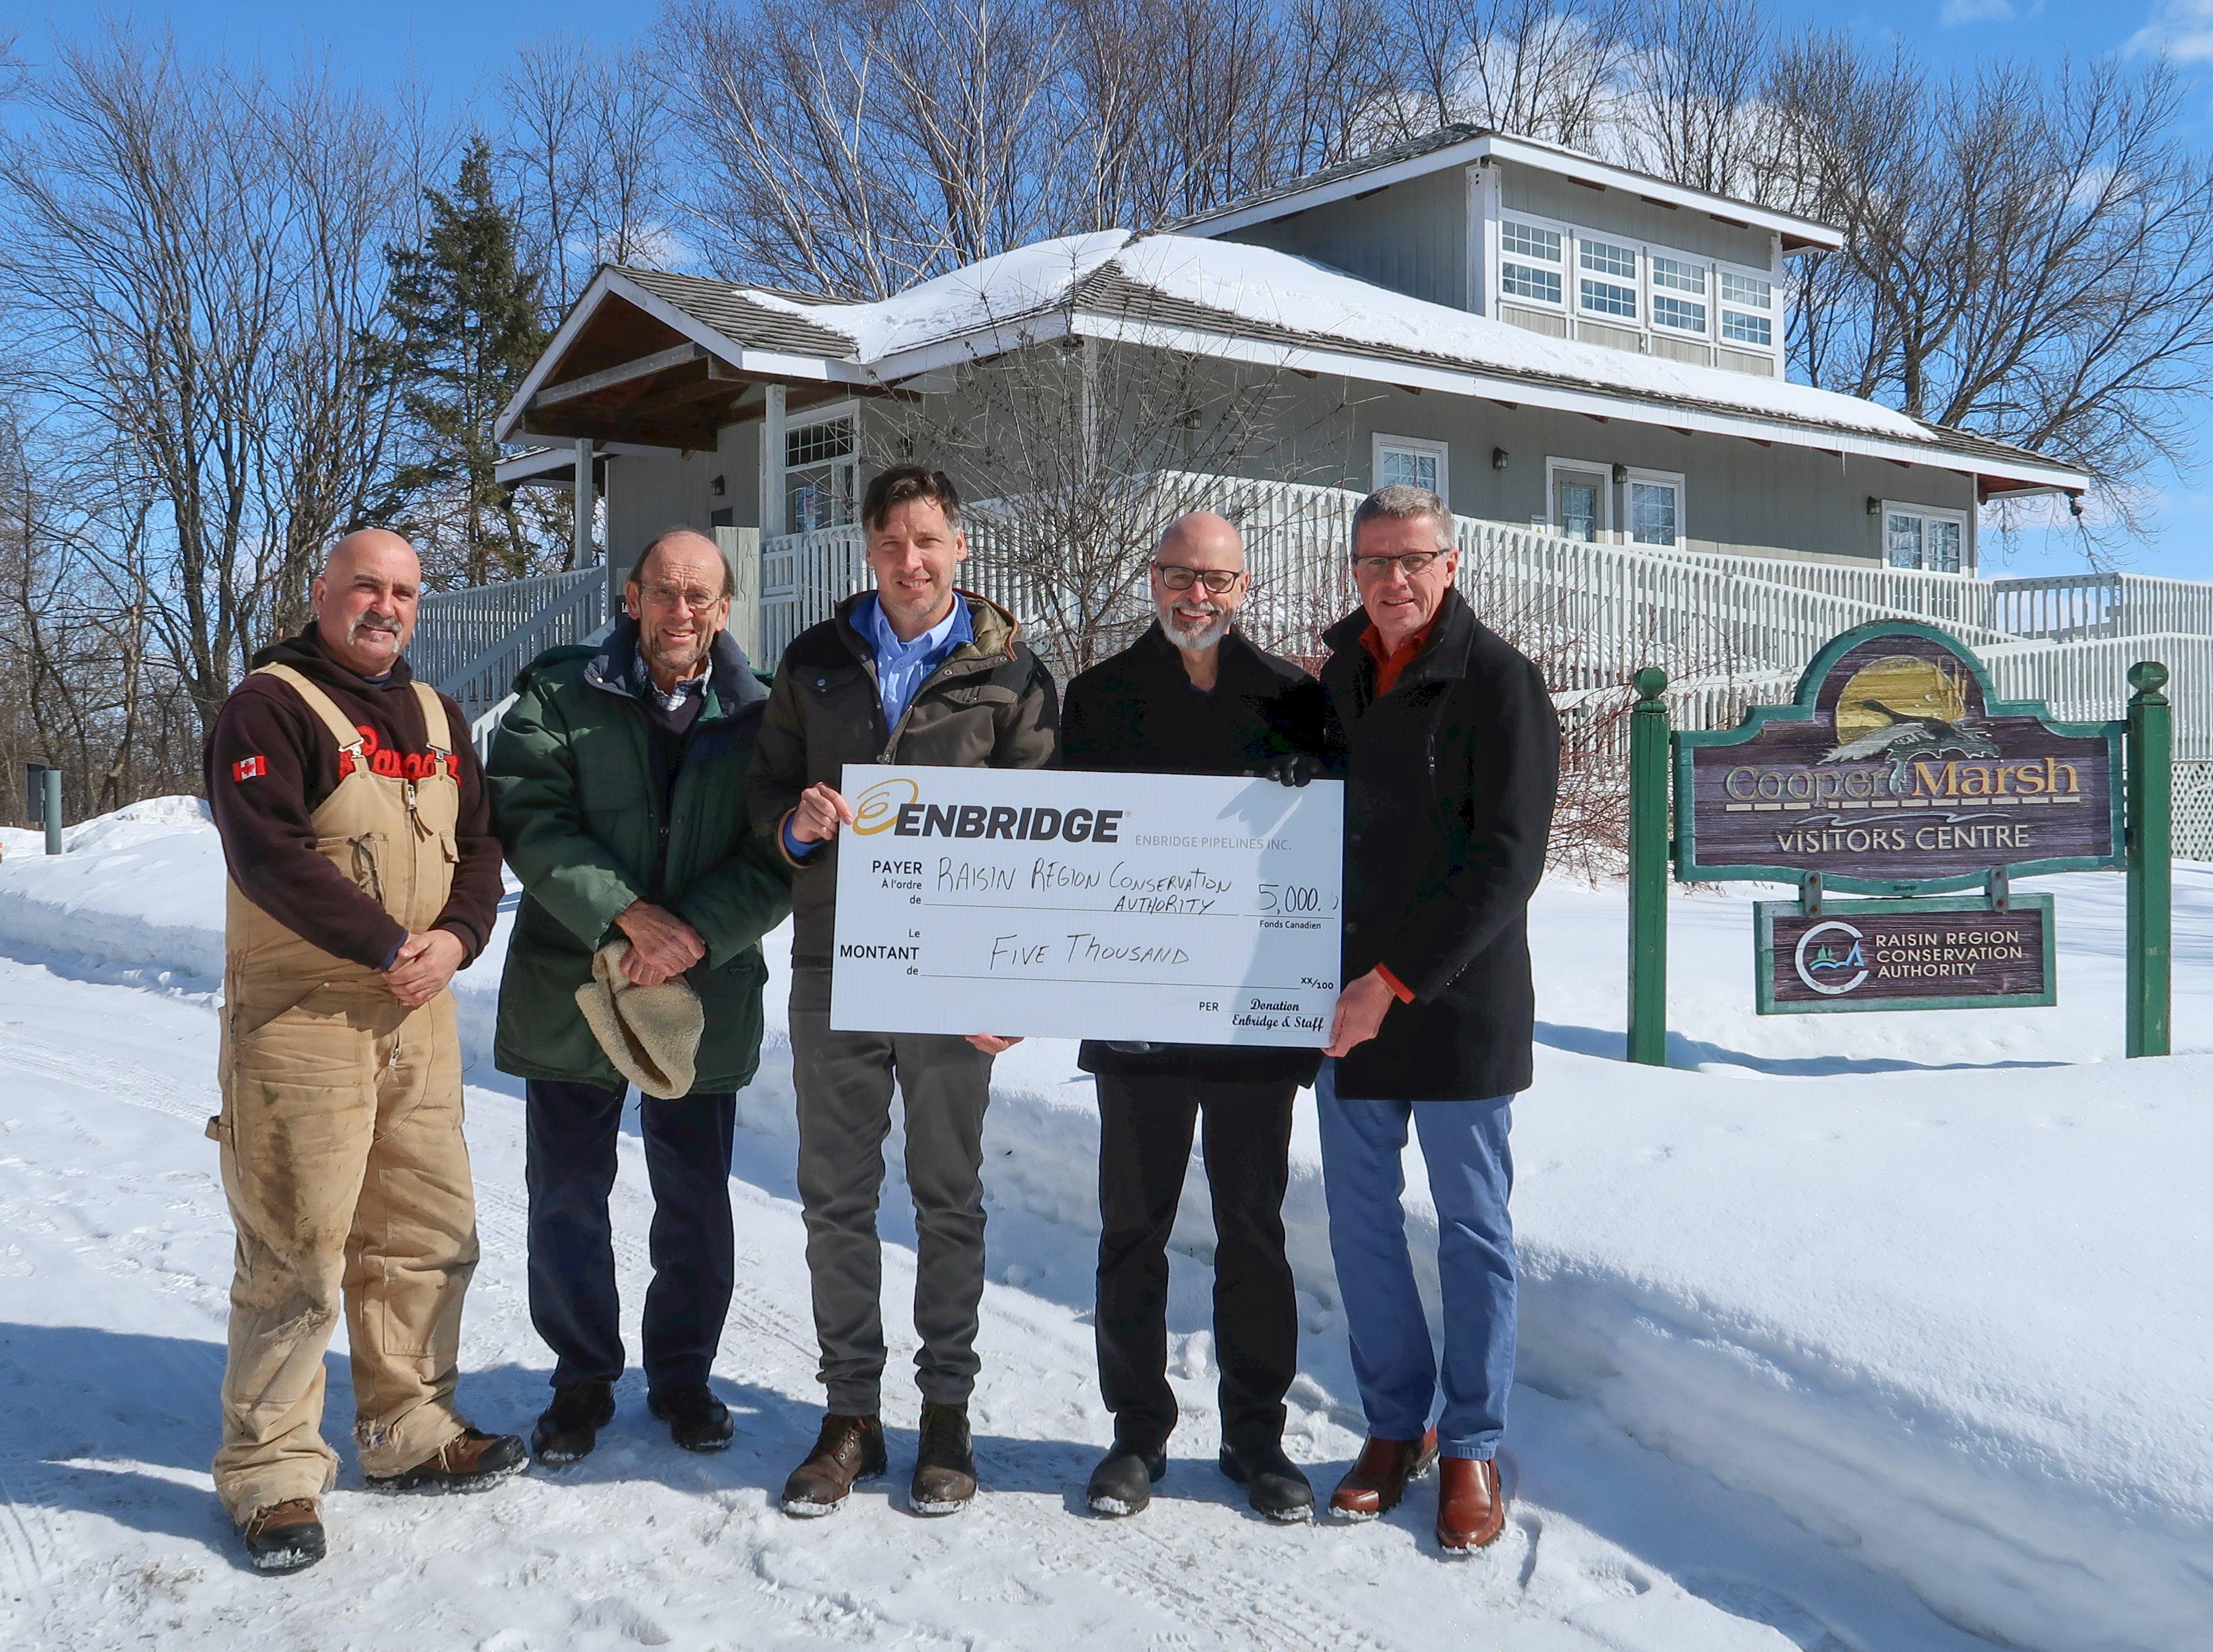 Enbridge Donates $5,000 to RRCA for Cooper Marsh Visitors Centre Upgrades